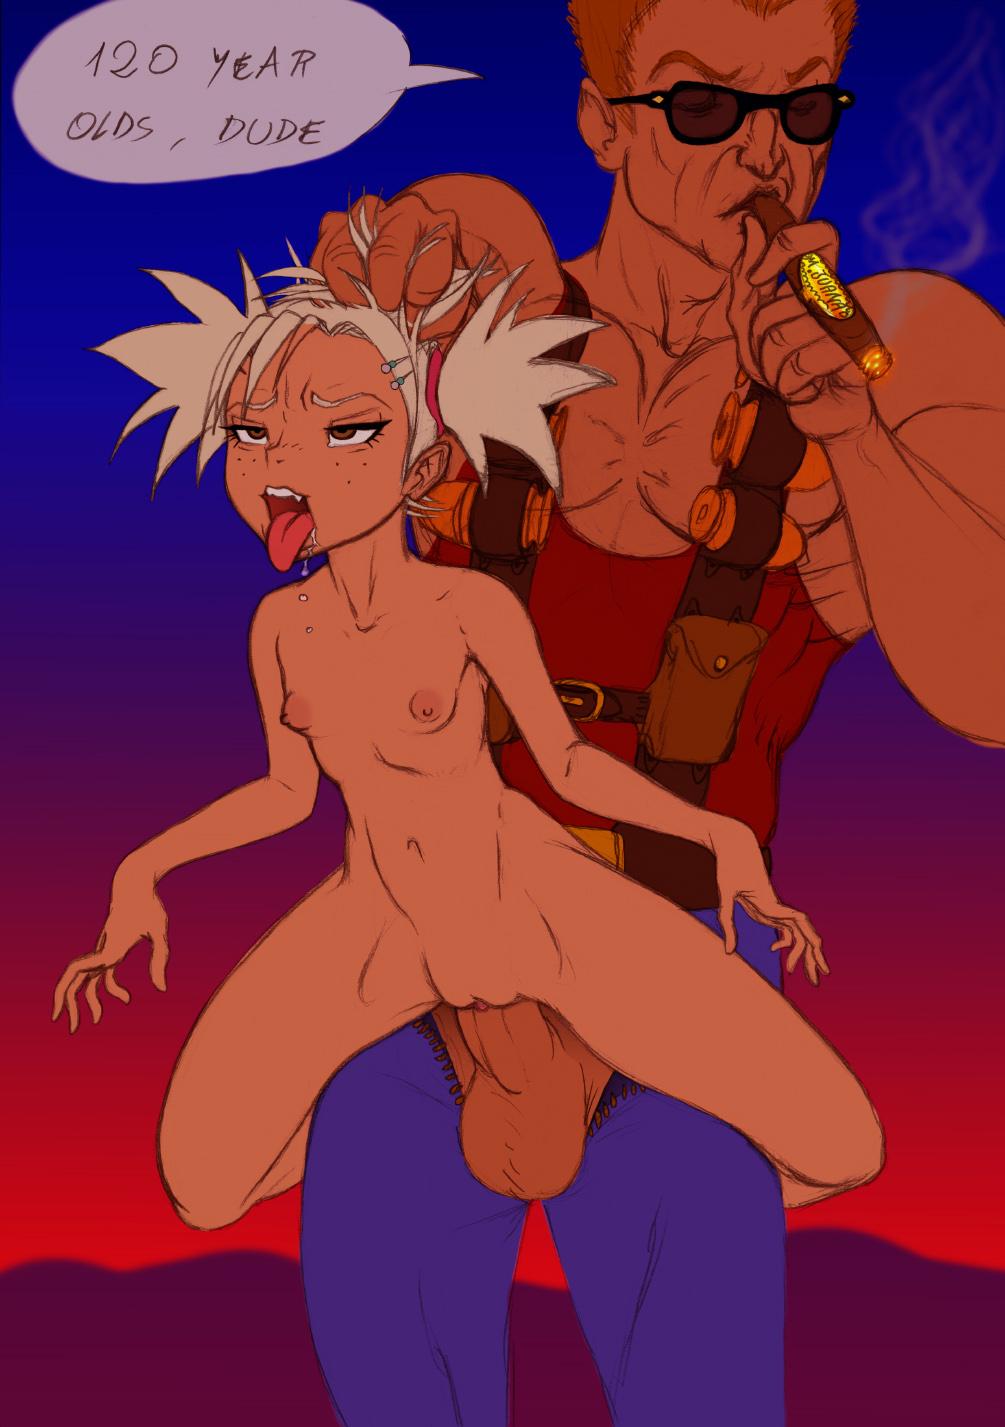 Duke nukem hentai porn nude galleries